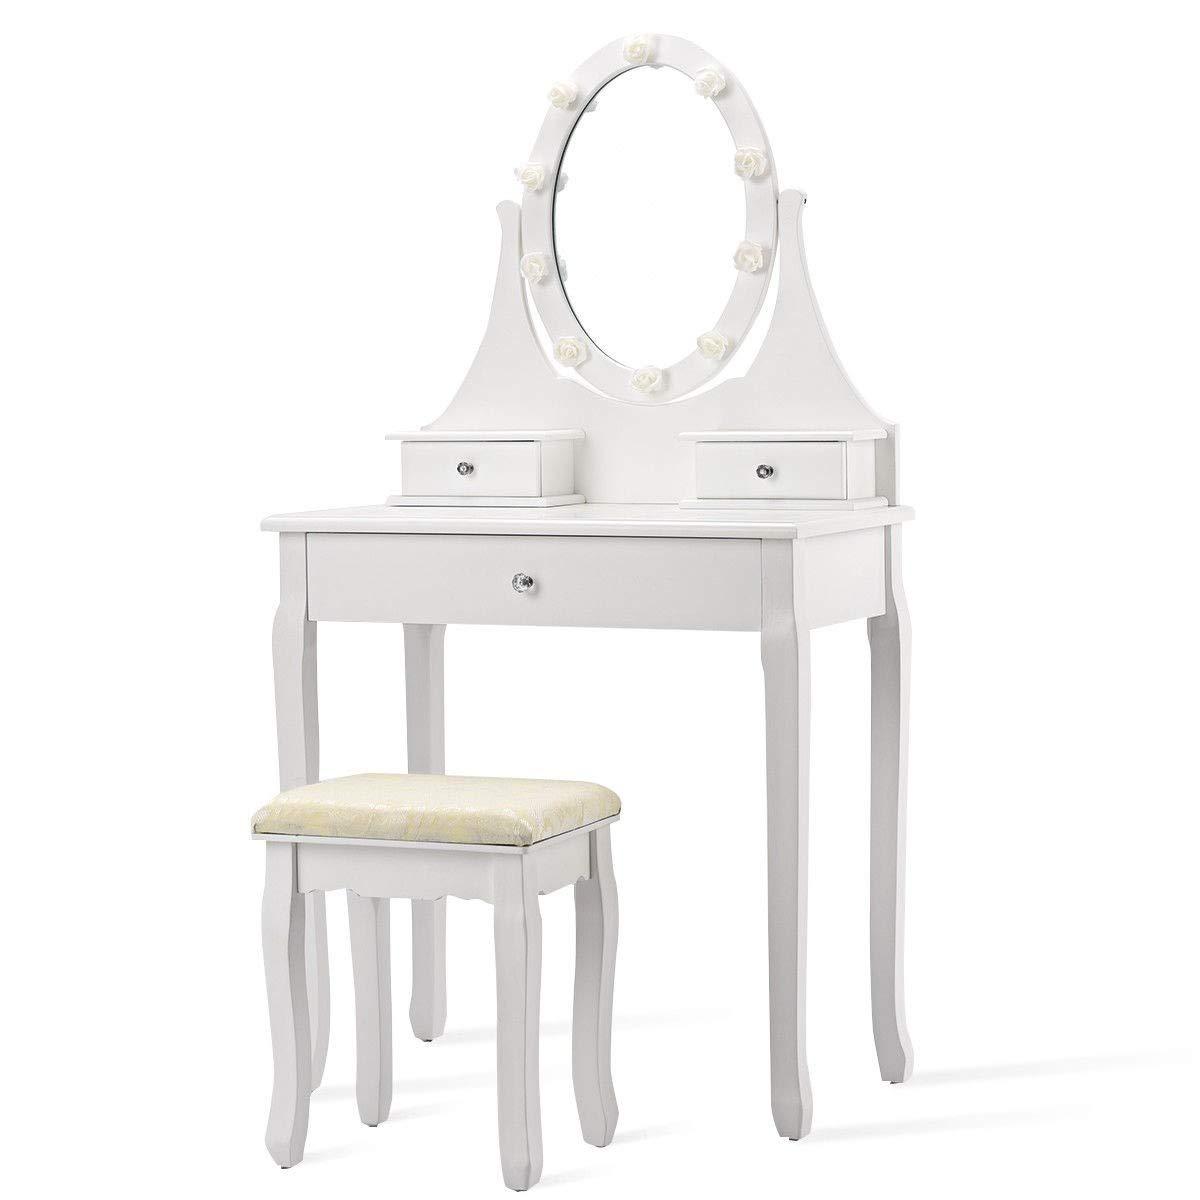 Dayanaprincess 3 Drawers Modern Luxury Nice Lighted Mirror Vanity Makeup Dressing Table Stool Set Bedroom Dressing Room Furniture Storage Organizer Durable Chic Elegant